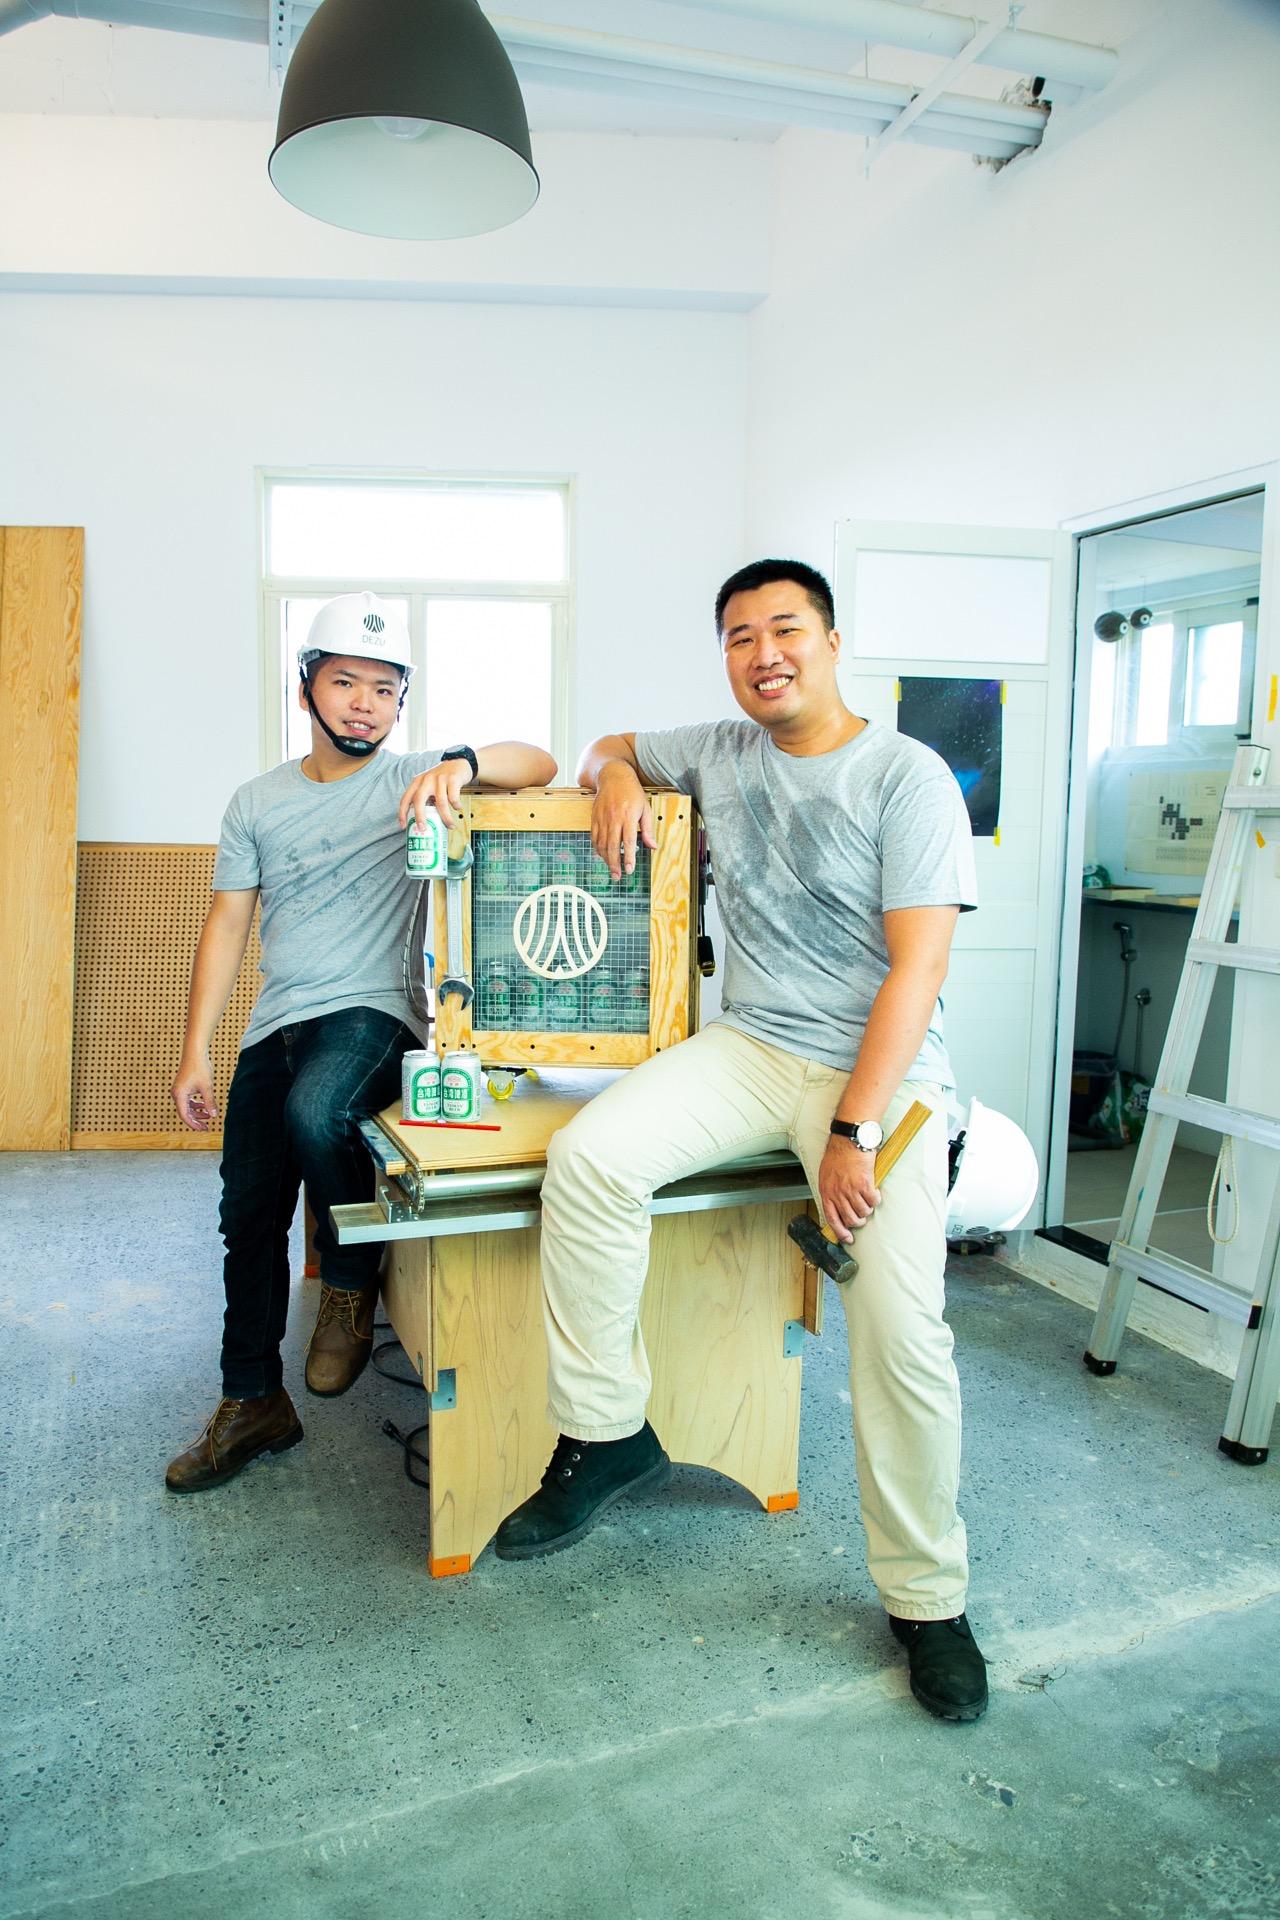 德築-DEZU-project-cooler-design-game-refrigerator-create-11